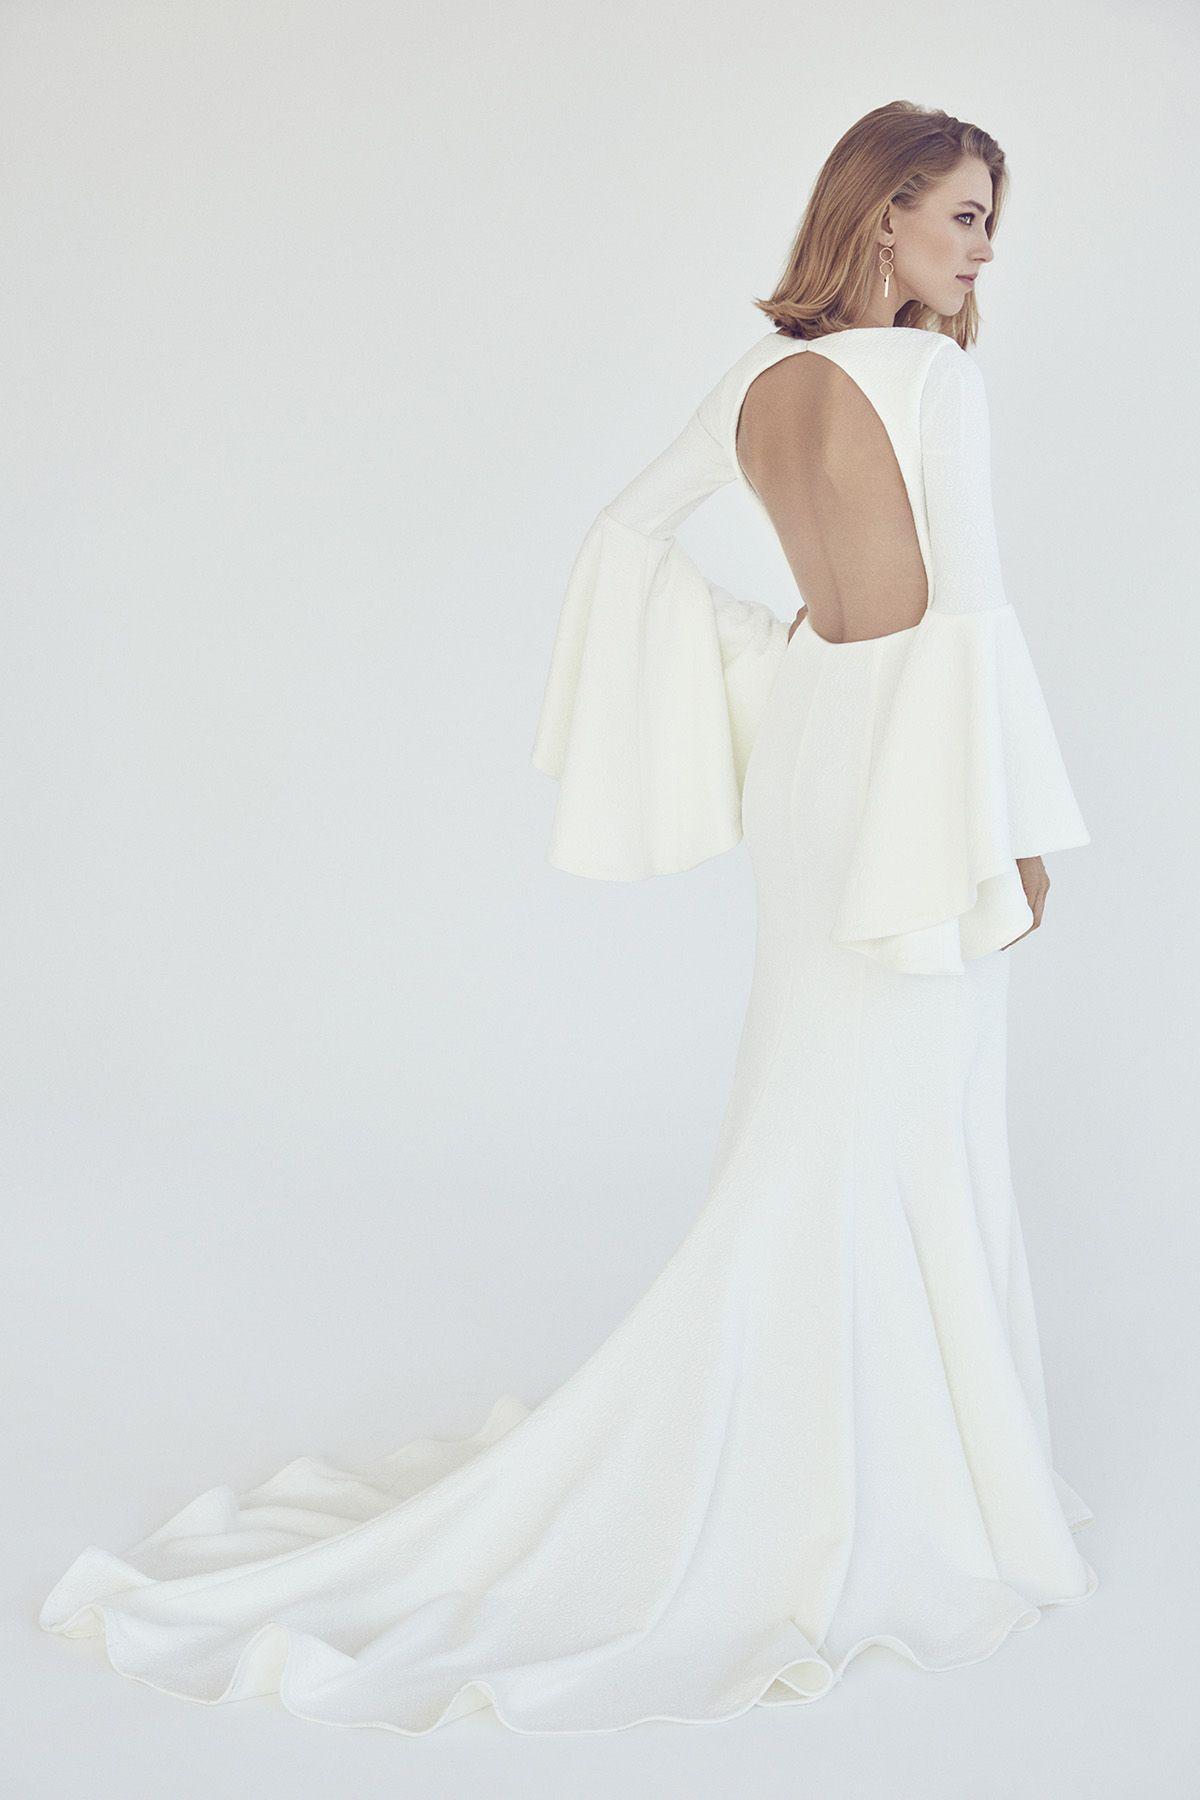 Suzanne harward ready to wear pinterest wedding dress